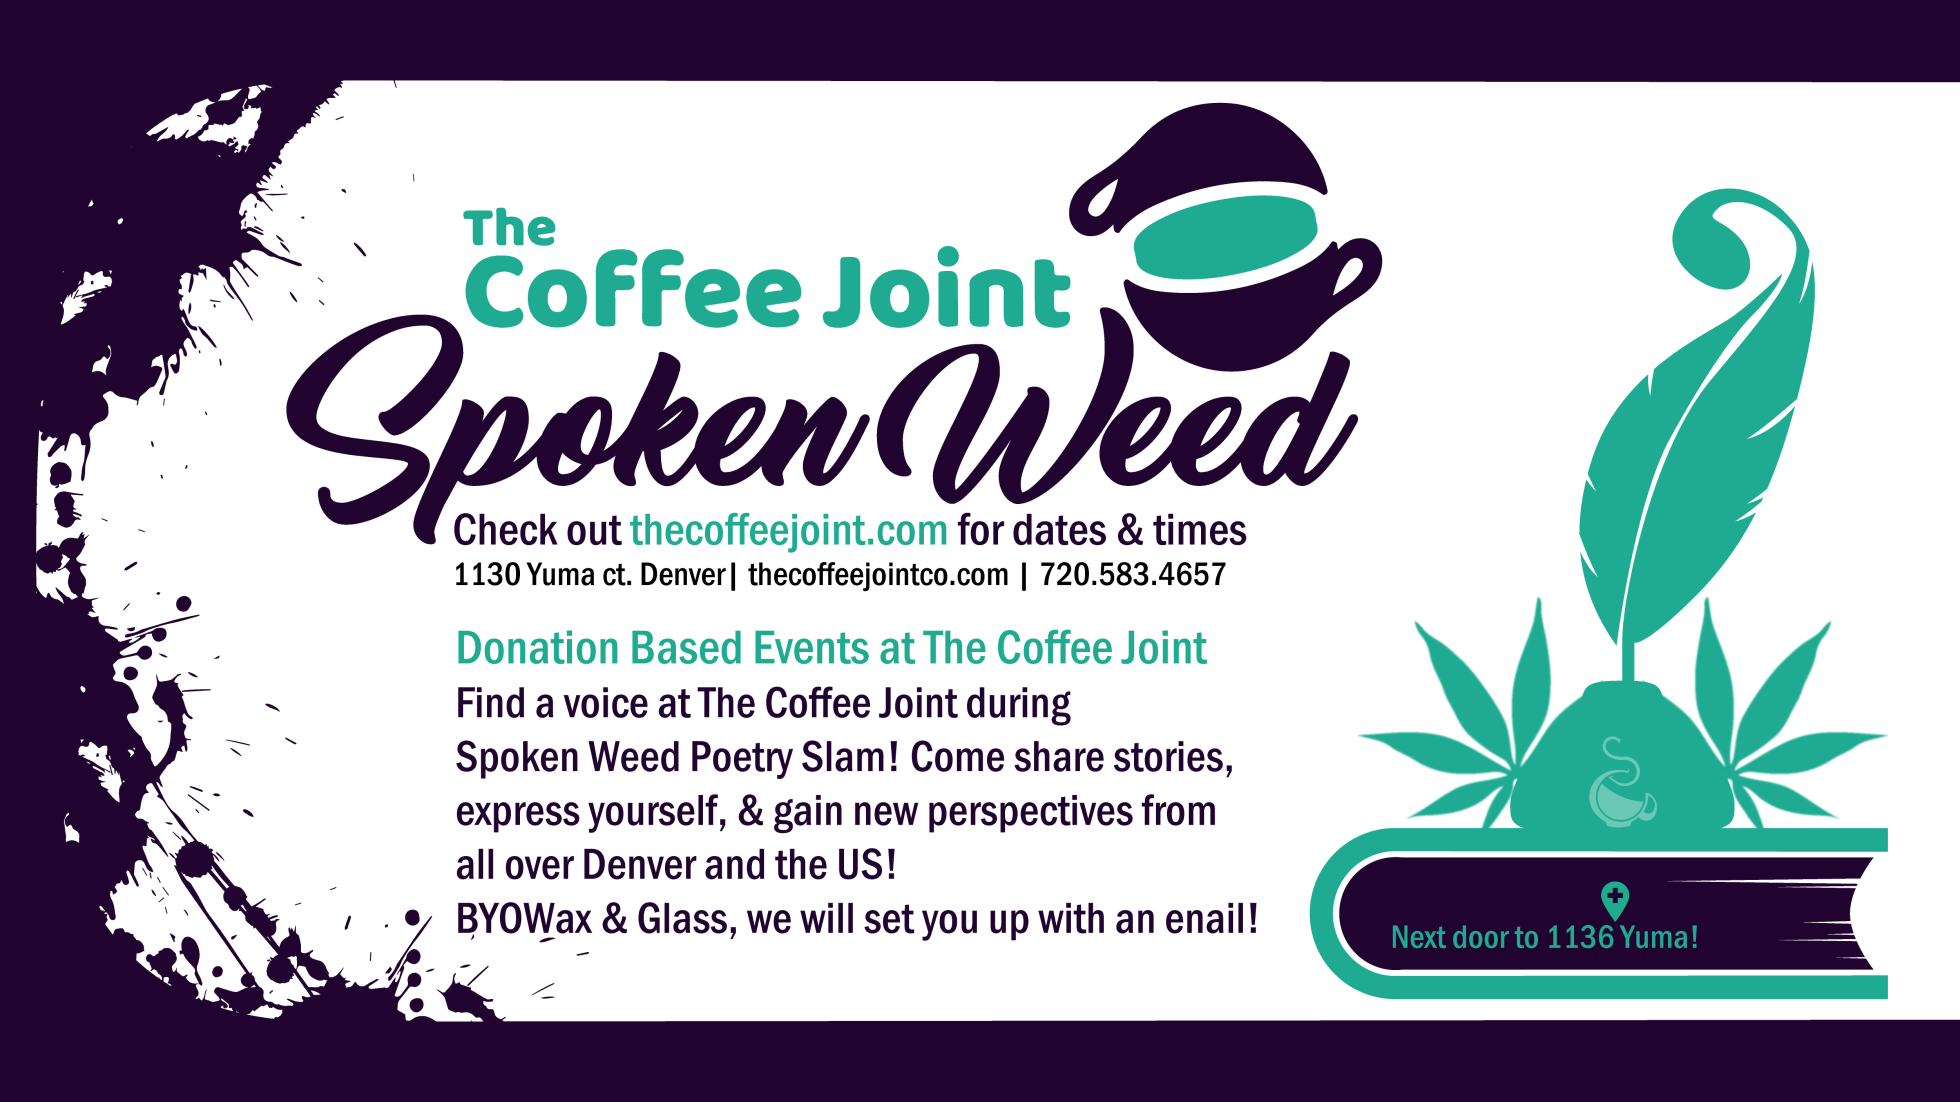 Spoken Weed